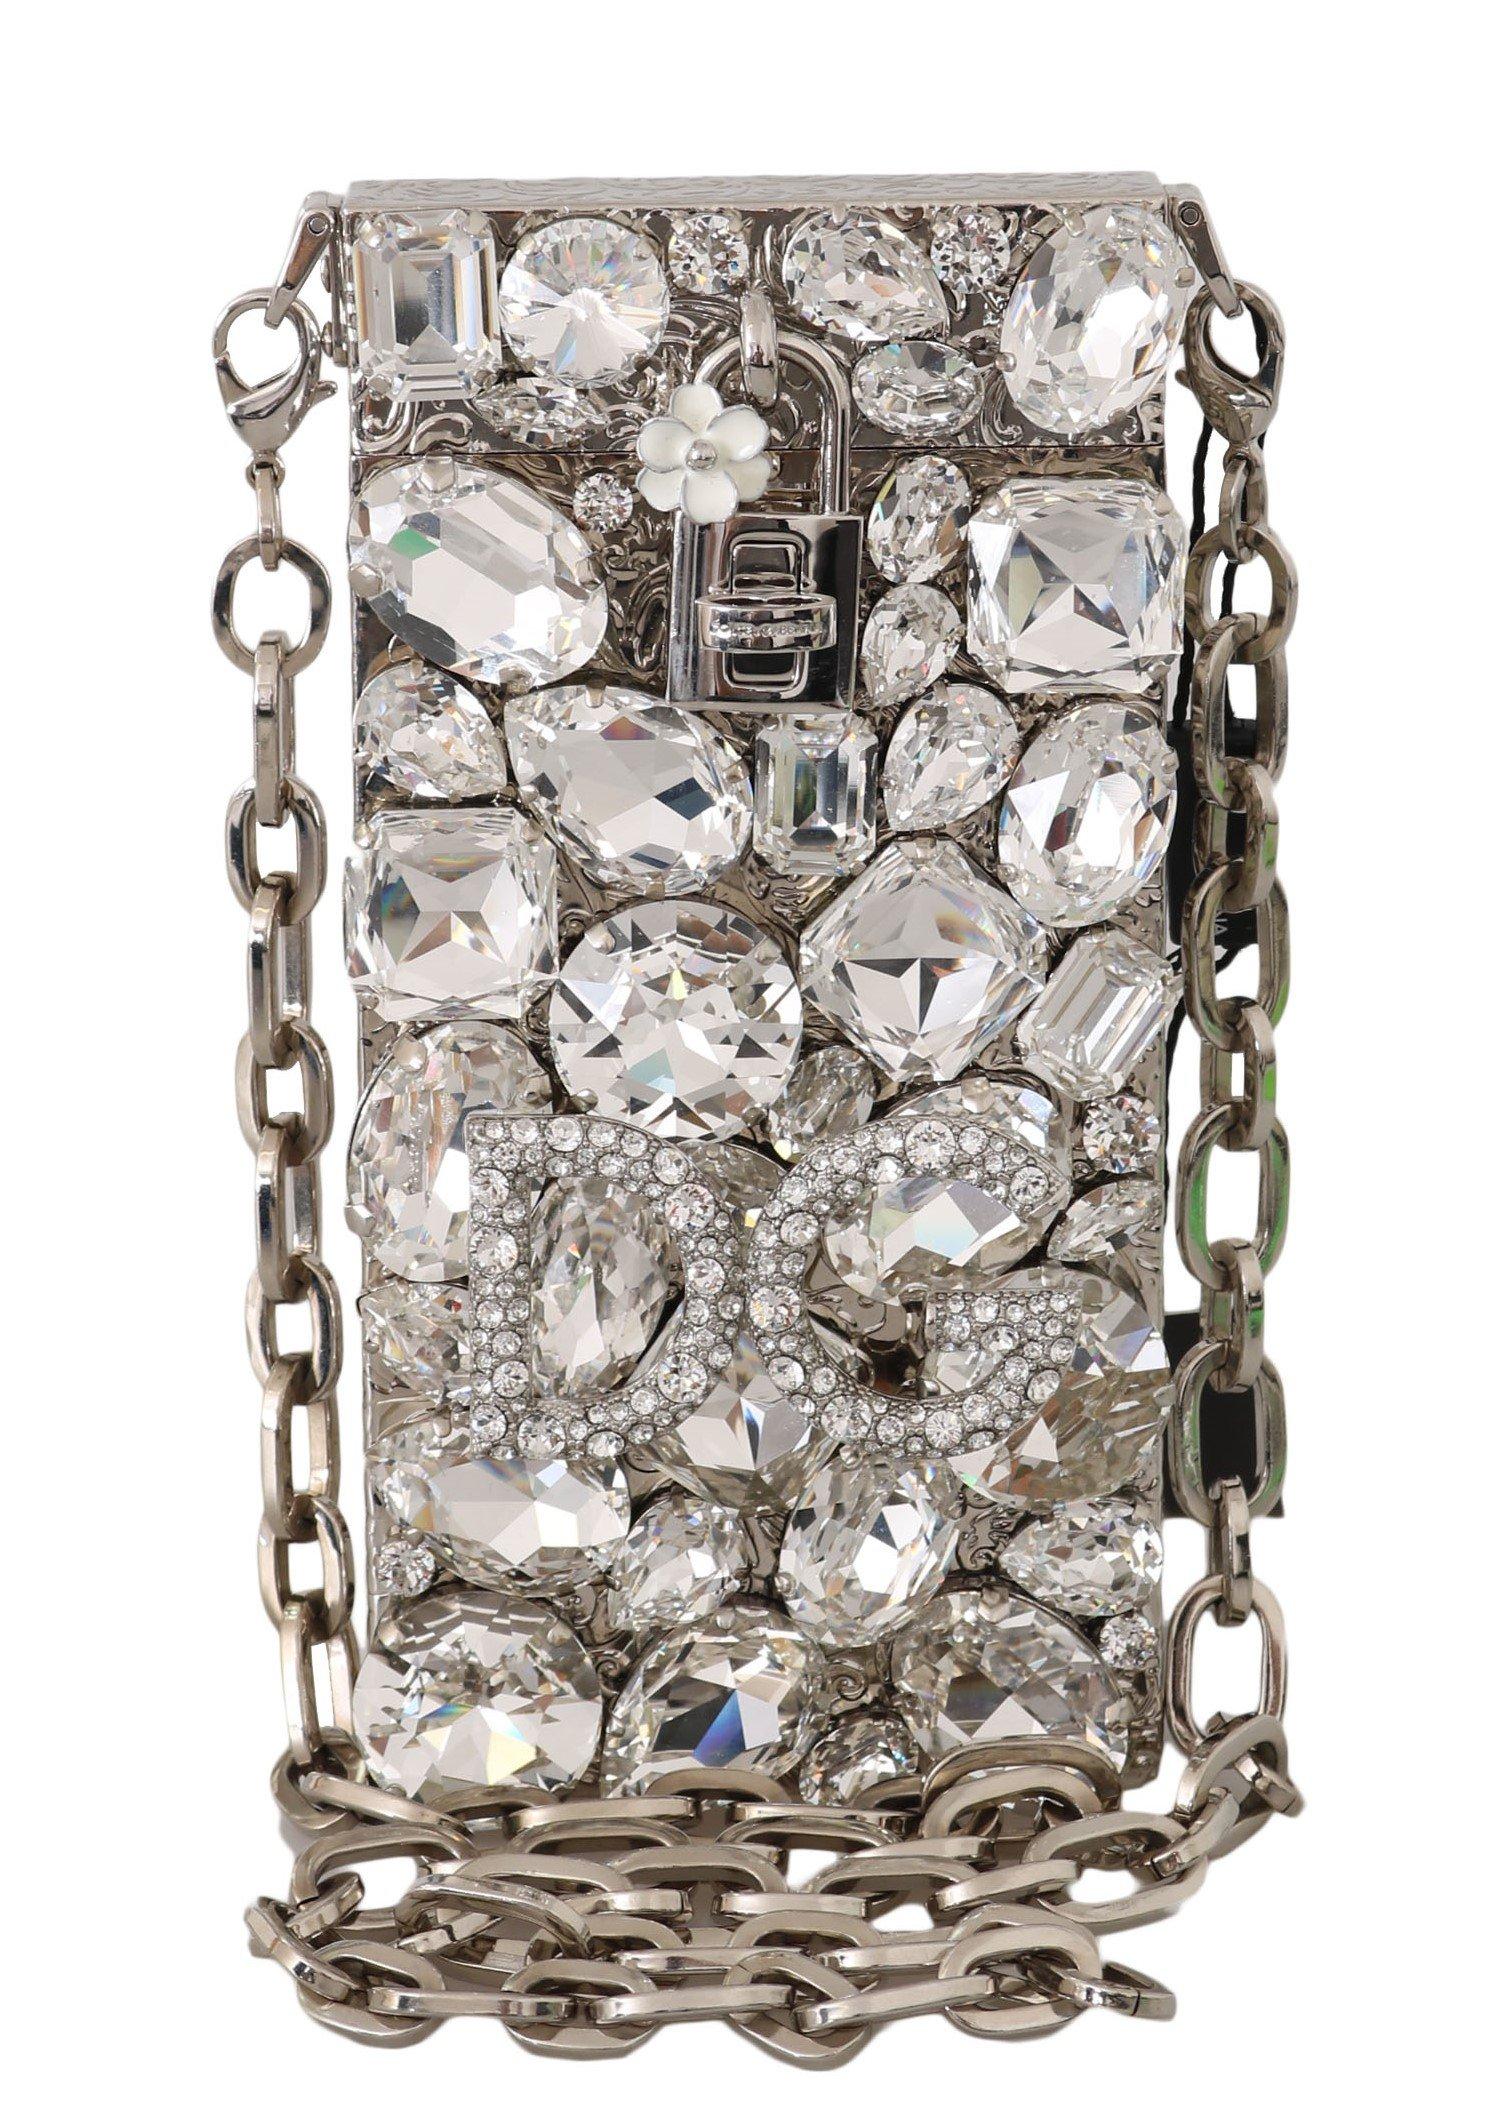 Dolce & Gabbana Women's Crystal Brass Crystal Crossbody Bag Silver VA1140